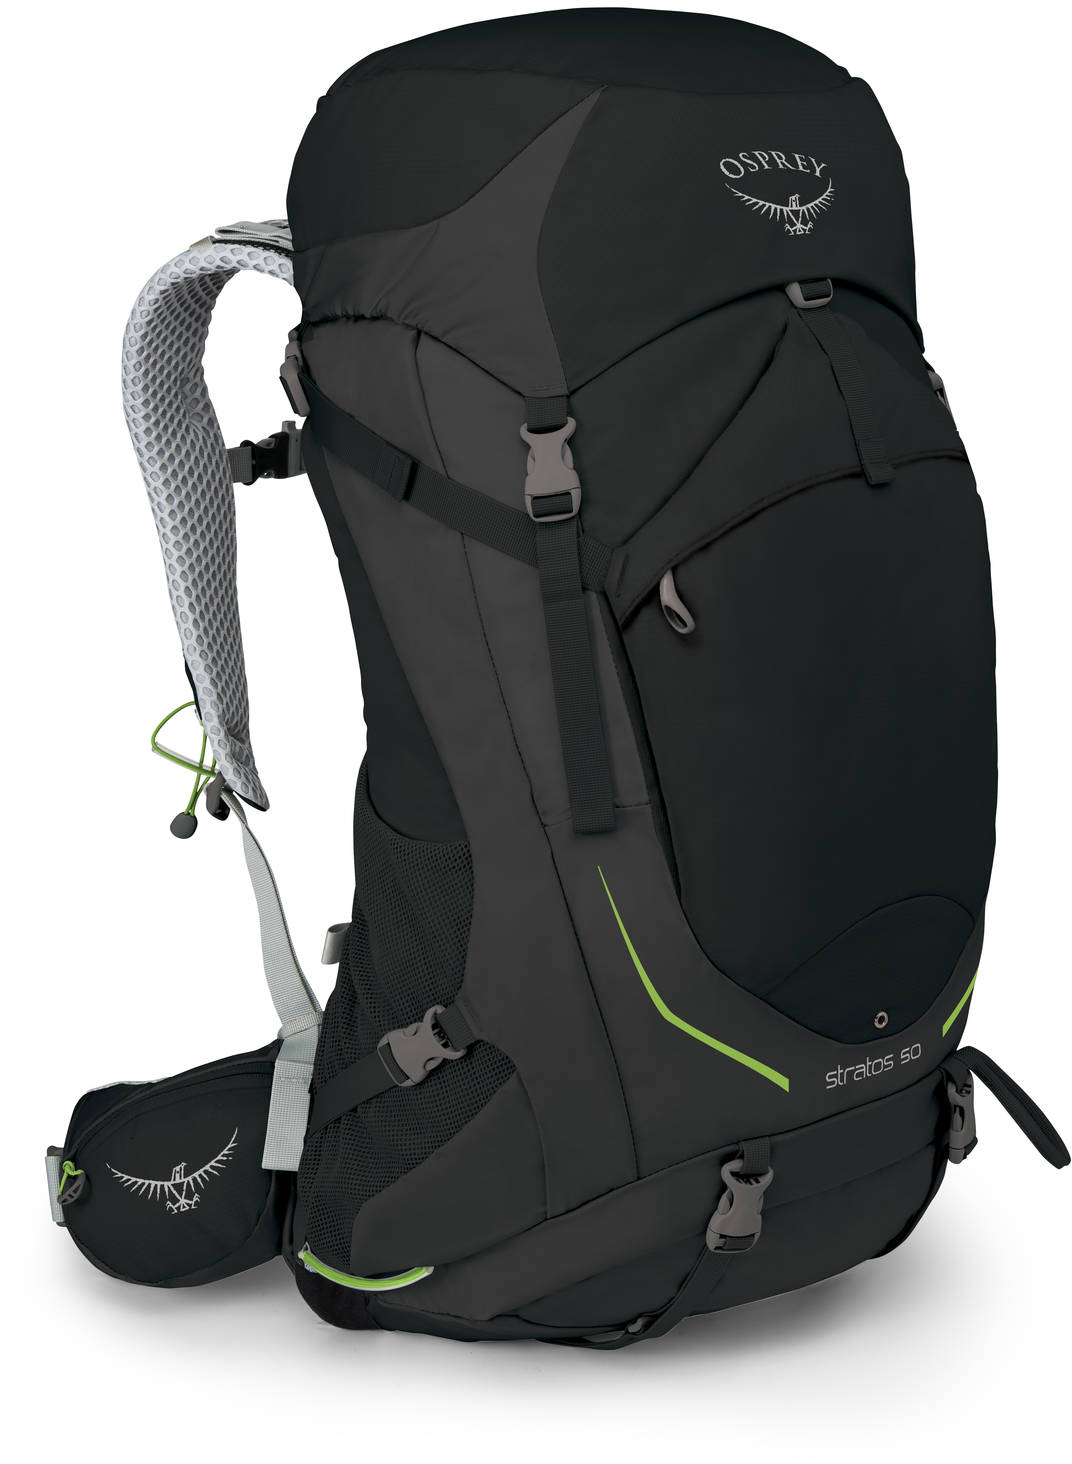 Туристические рюкзаки Рюкзак туристический Osprey Stratos 50 Stratos_50_S17_Side_Black_web.jpg